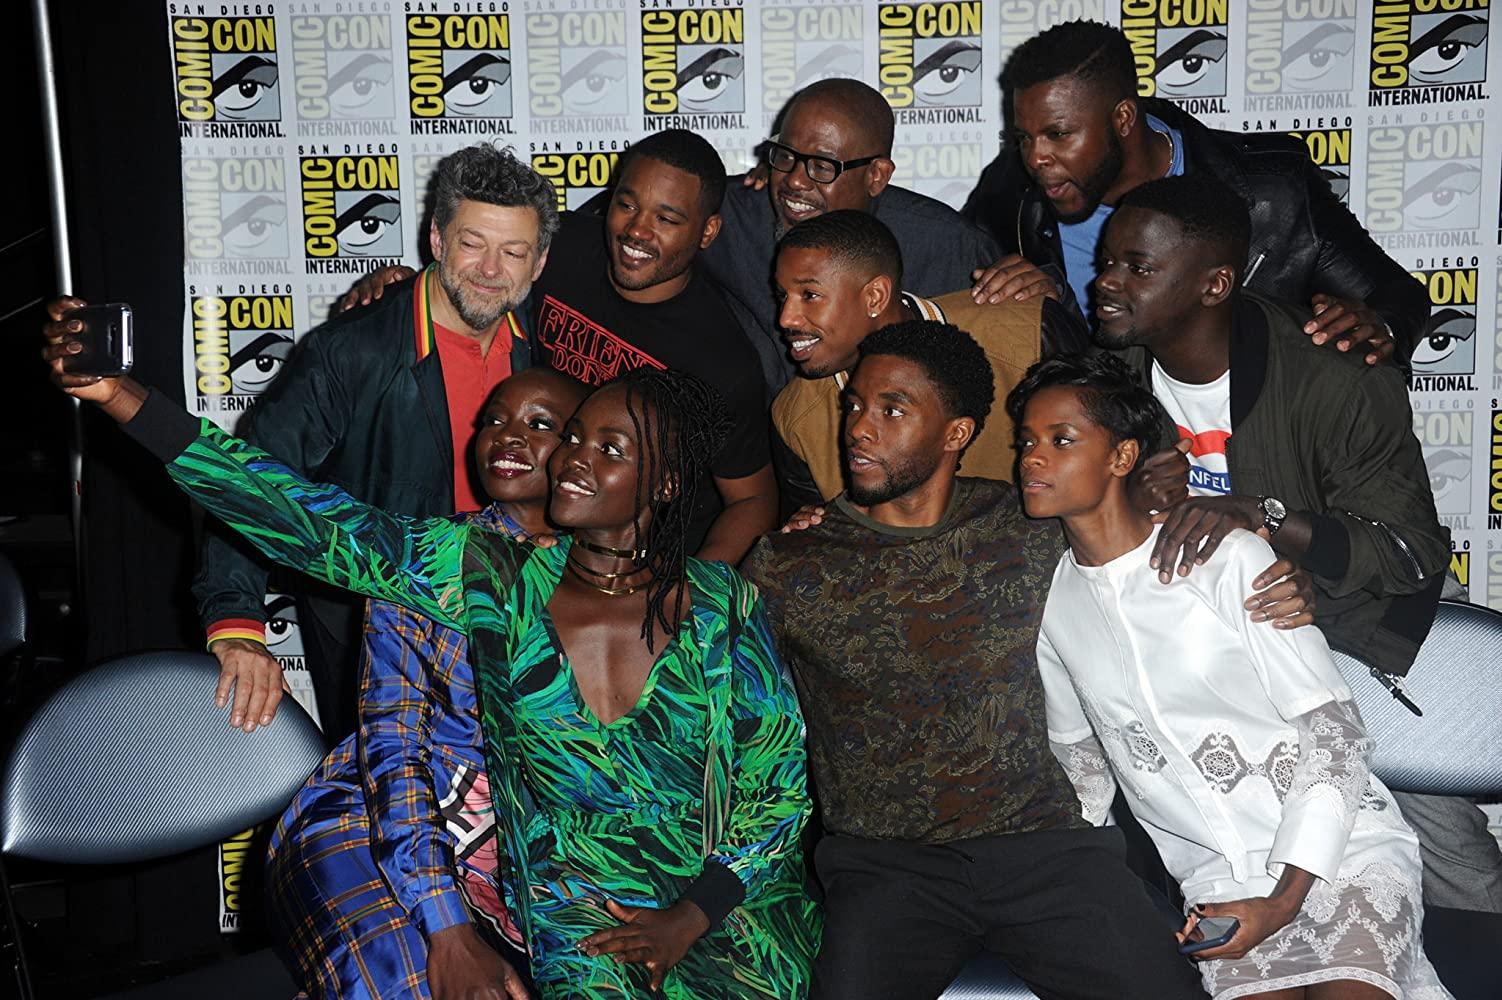 Forest Whitaker, Michael B. Jordan, Andy Serkis, Chadwick Boseman, Danai Gurira, Lupita Nyong'o, Daniel Kaluuya, Ryan Coogler, Letitia Wright, and Winston Duke at an event for Black Panther (2018)